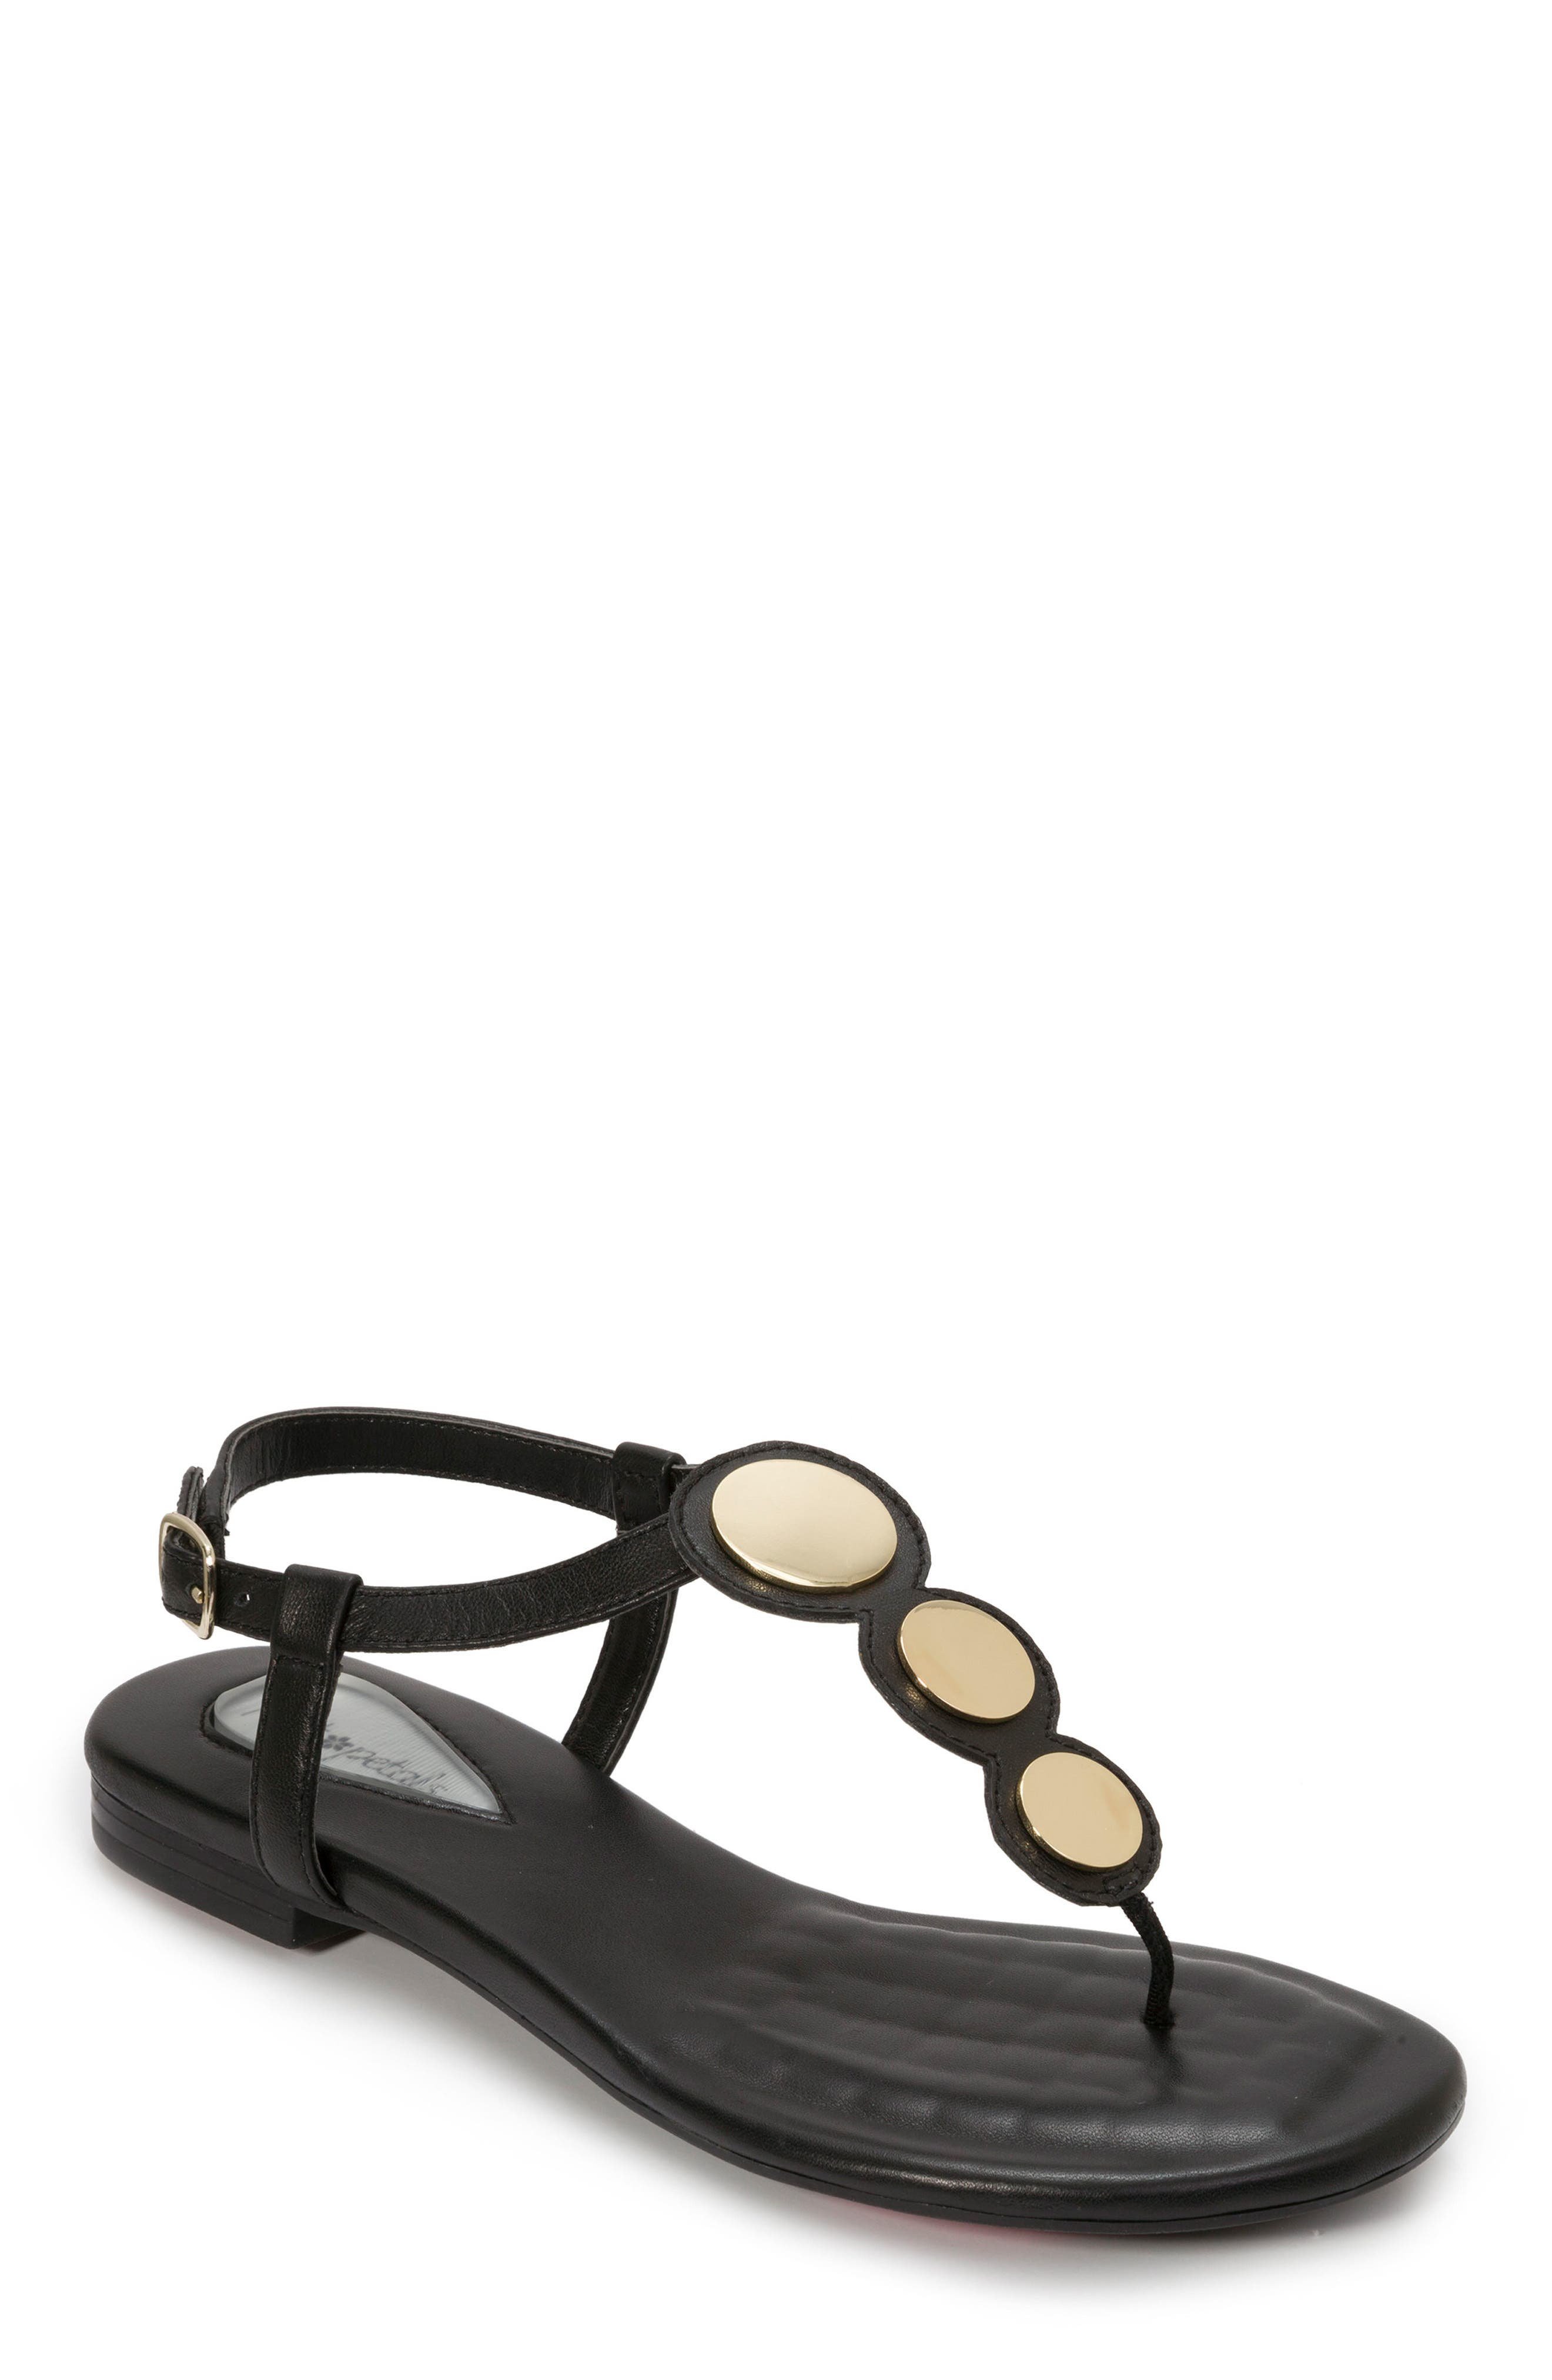 Foot Petals Ellie Sandal- Black